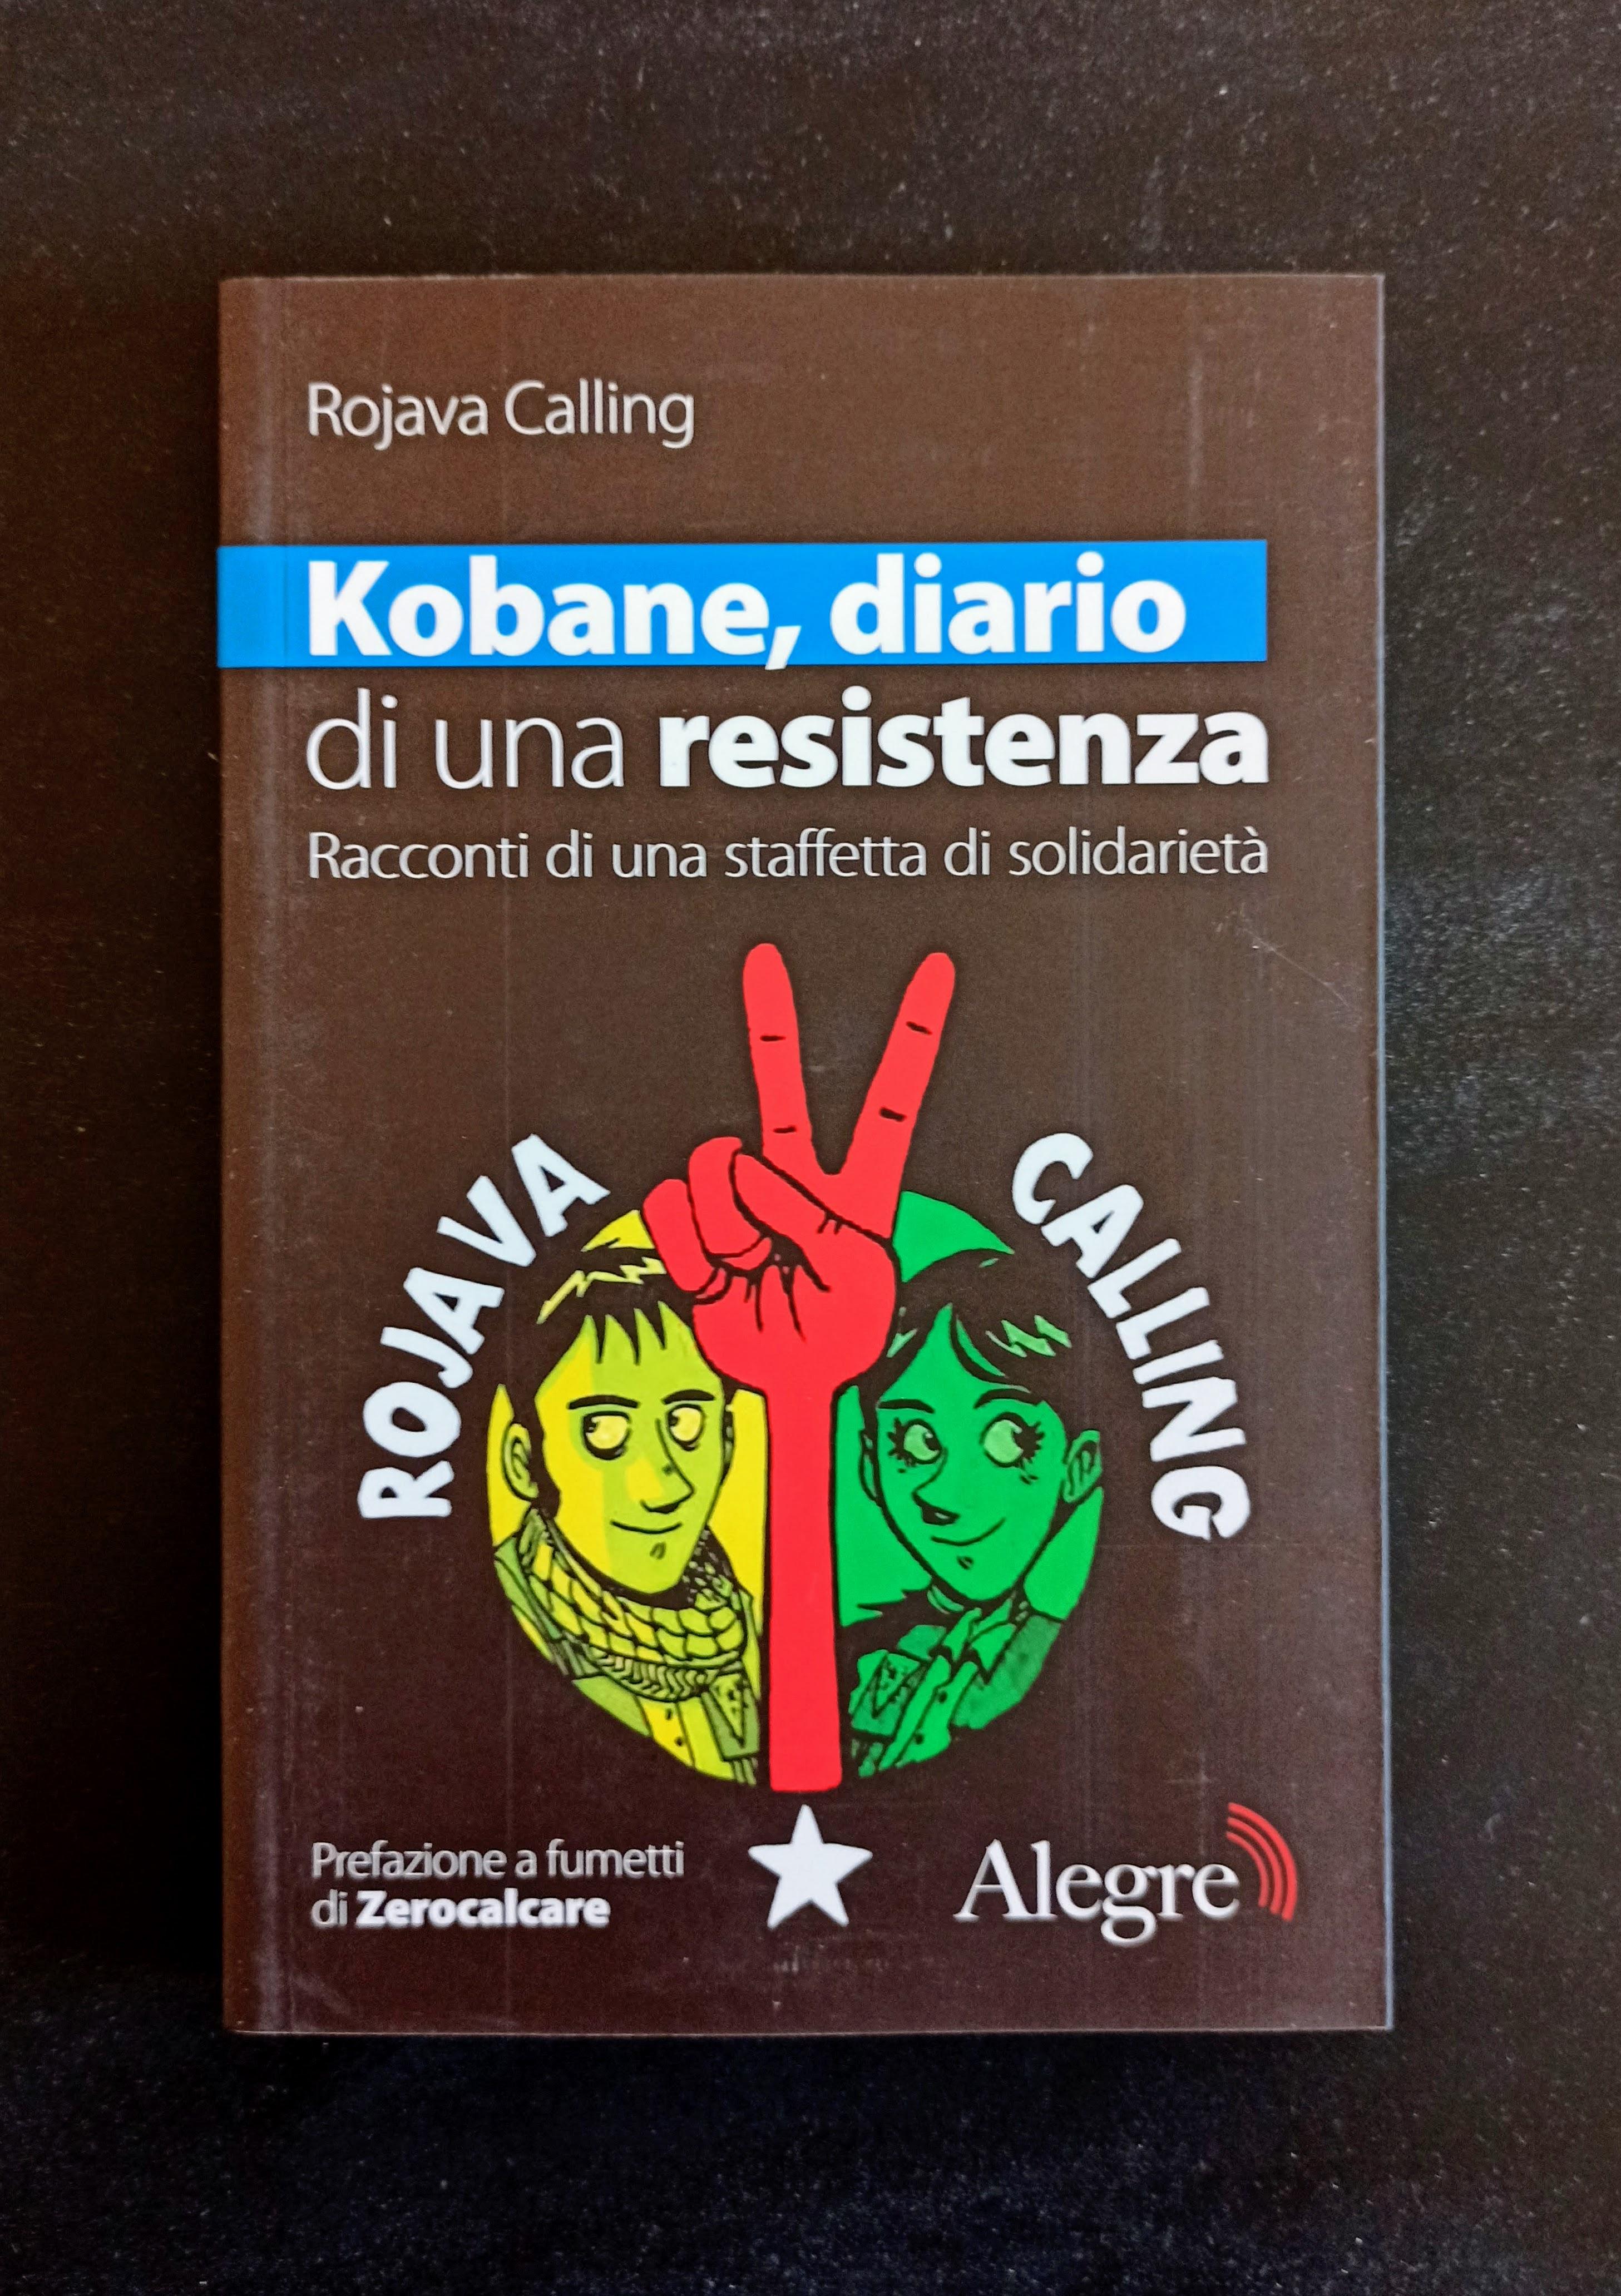 Kobane, diario di una resistenza - Racconti di una staffetta di solidarietà